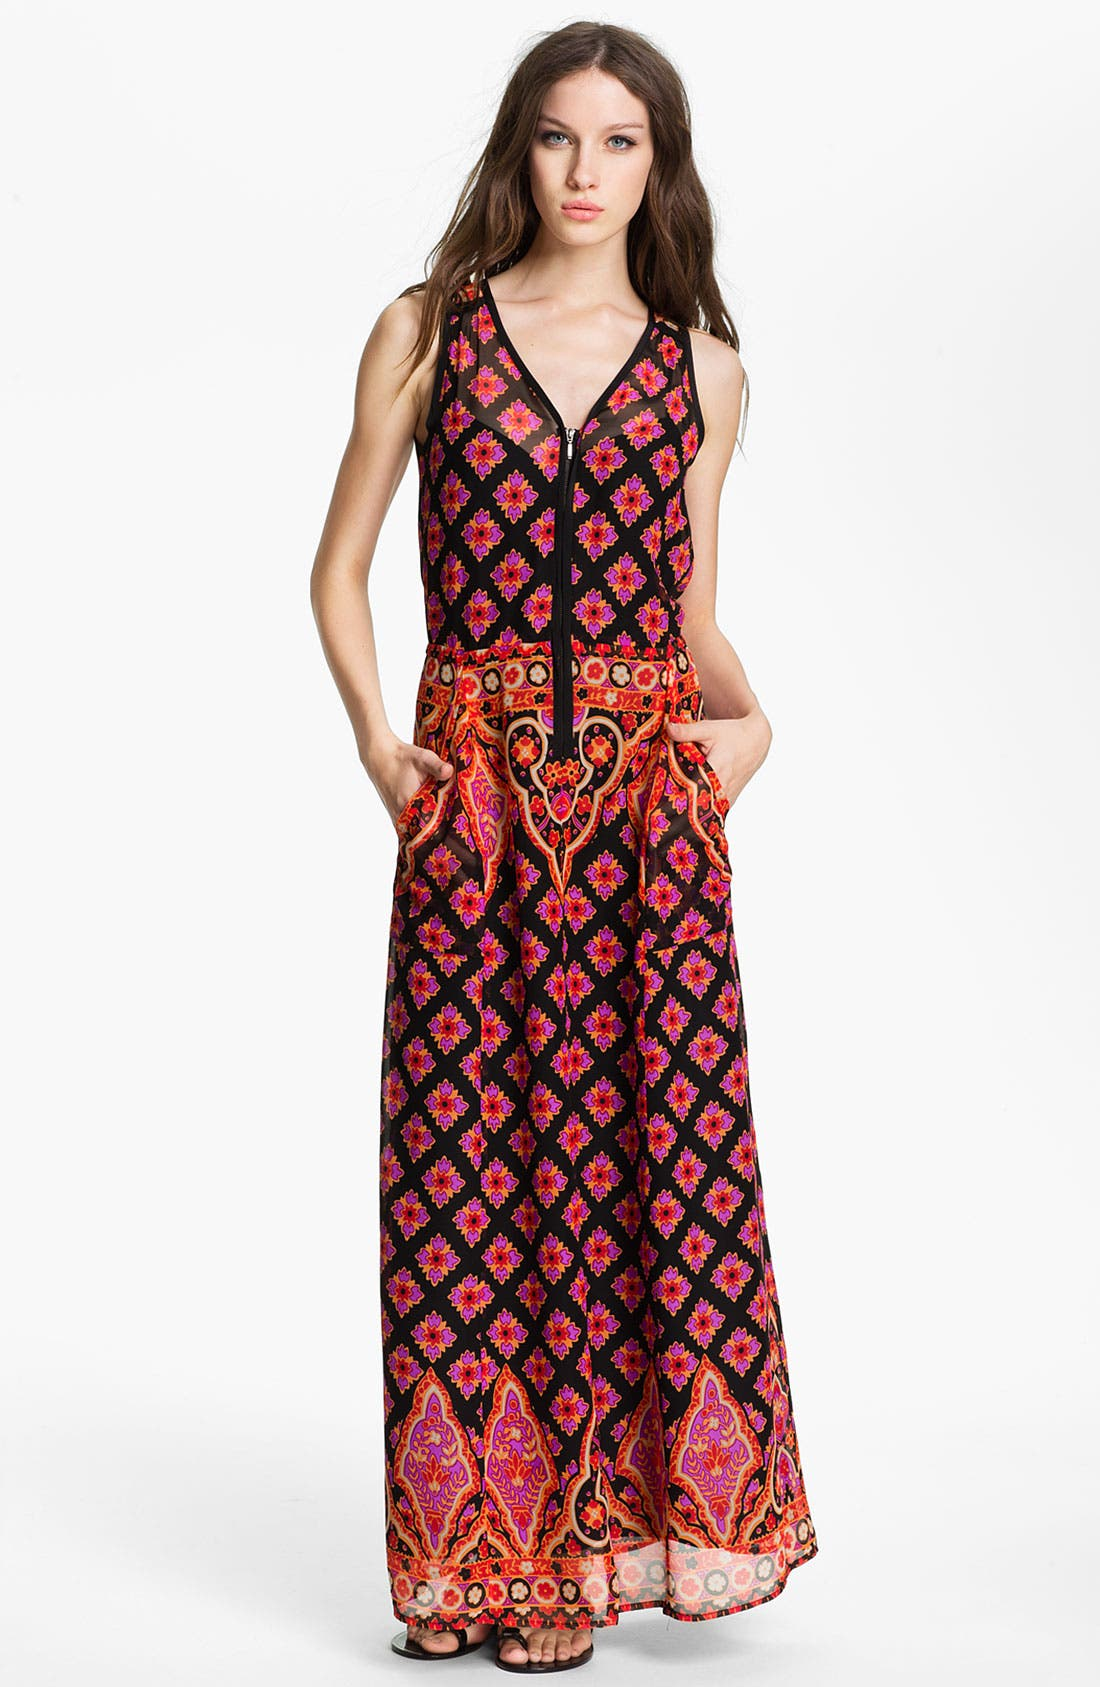 Alternate Image 1 Selected - Nanette Lepore 'Electrifying' Silk Maxi Dress